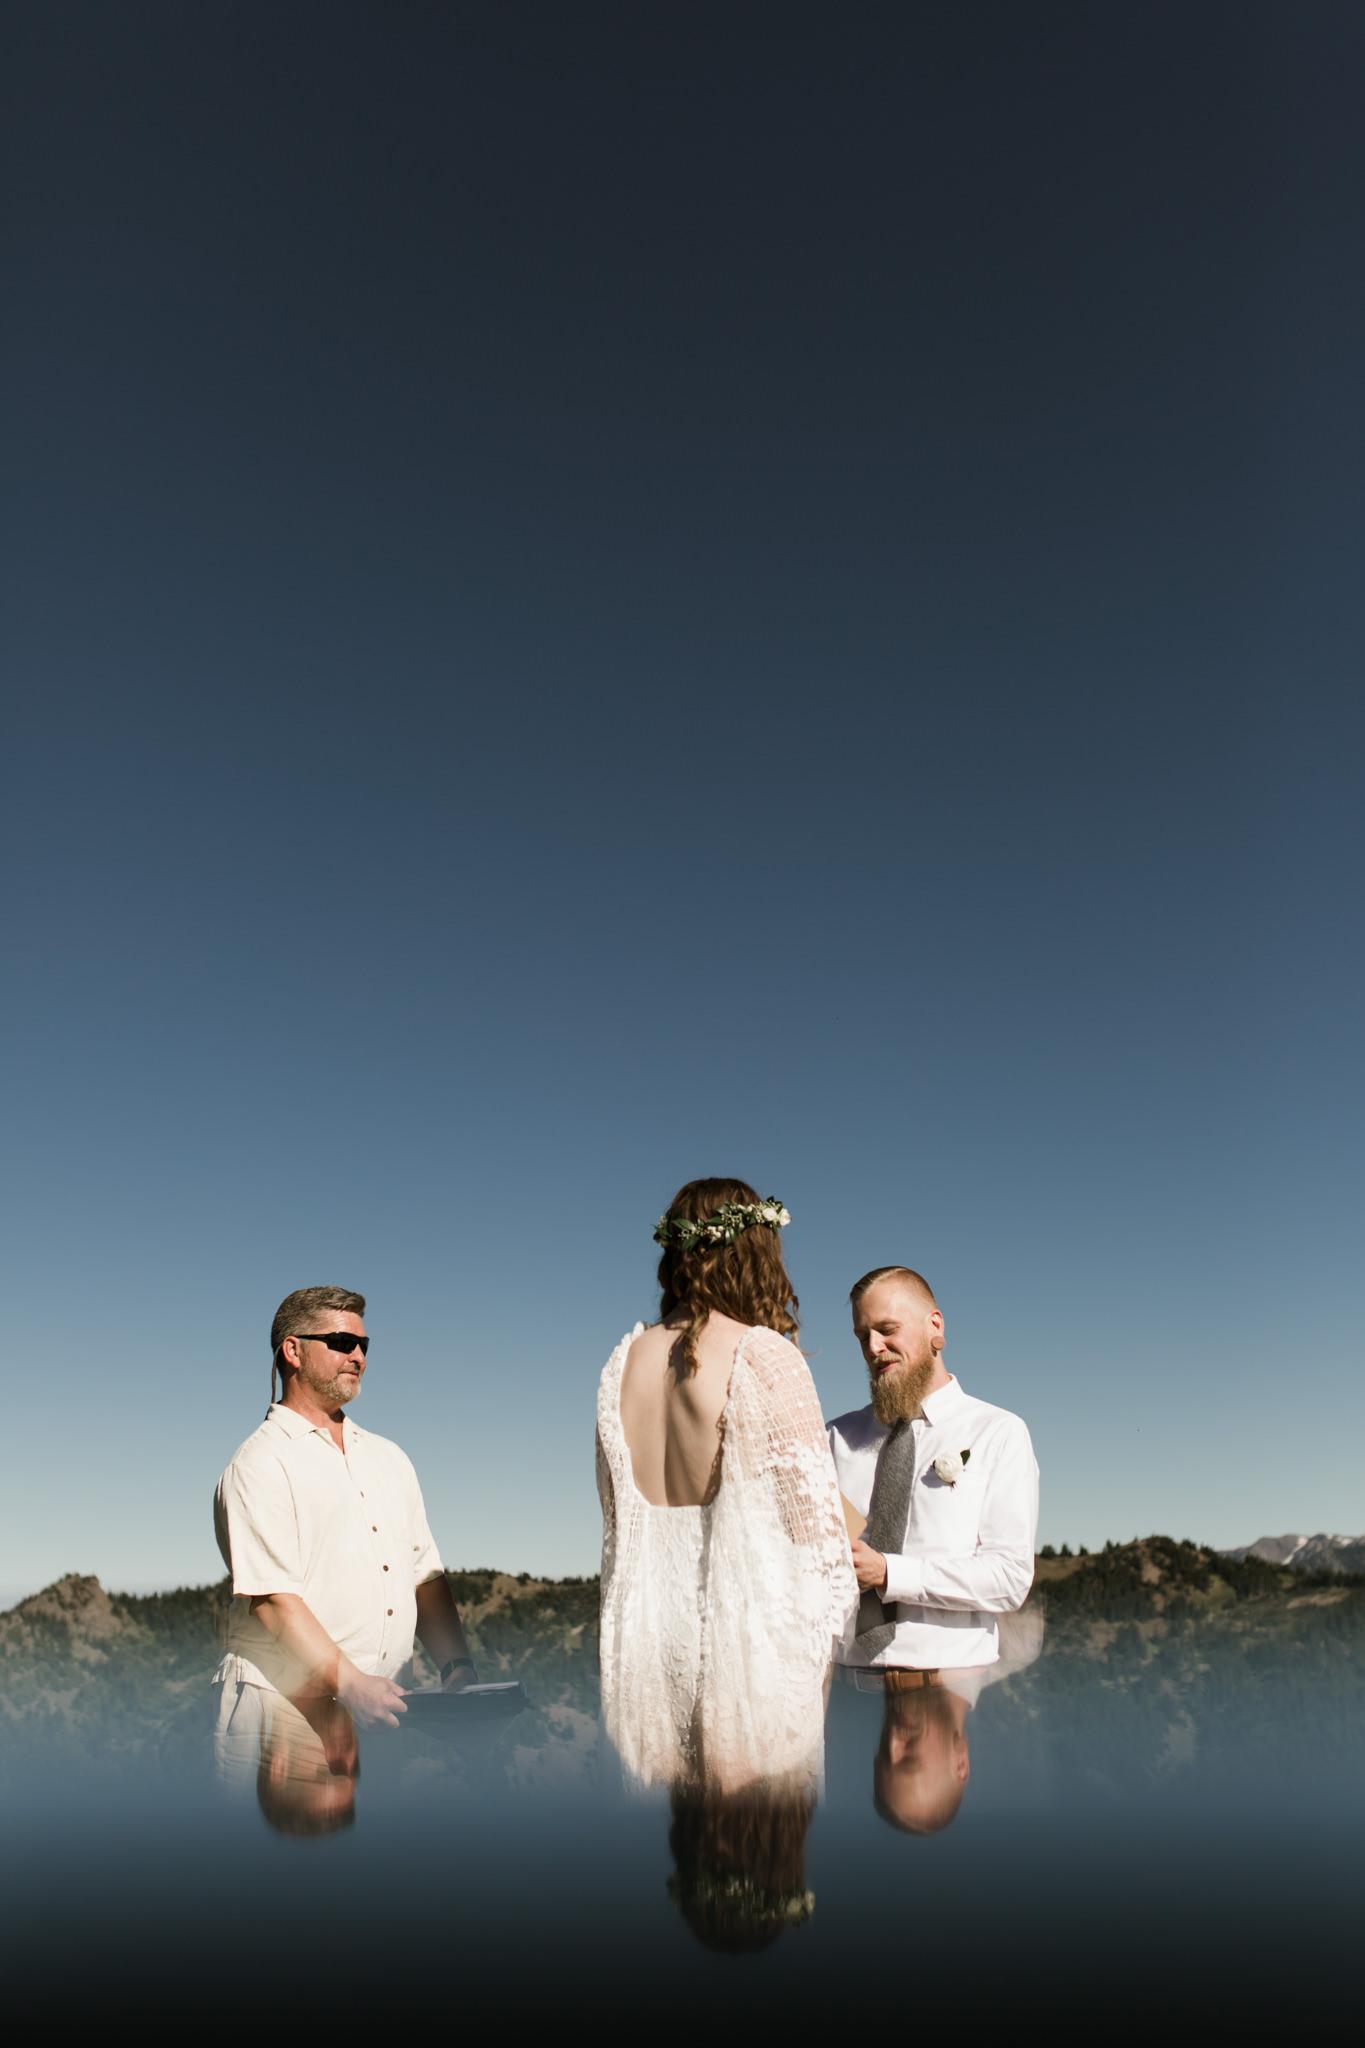 Jesse-Kasie-Hurricane-Ridge-Wedding-11.jpg